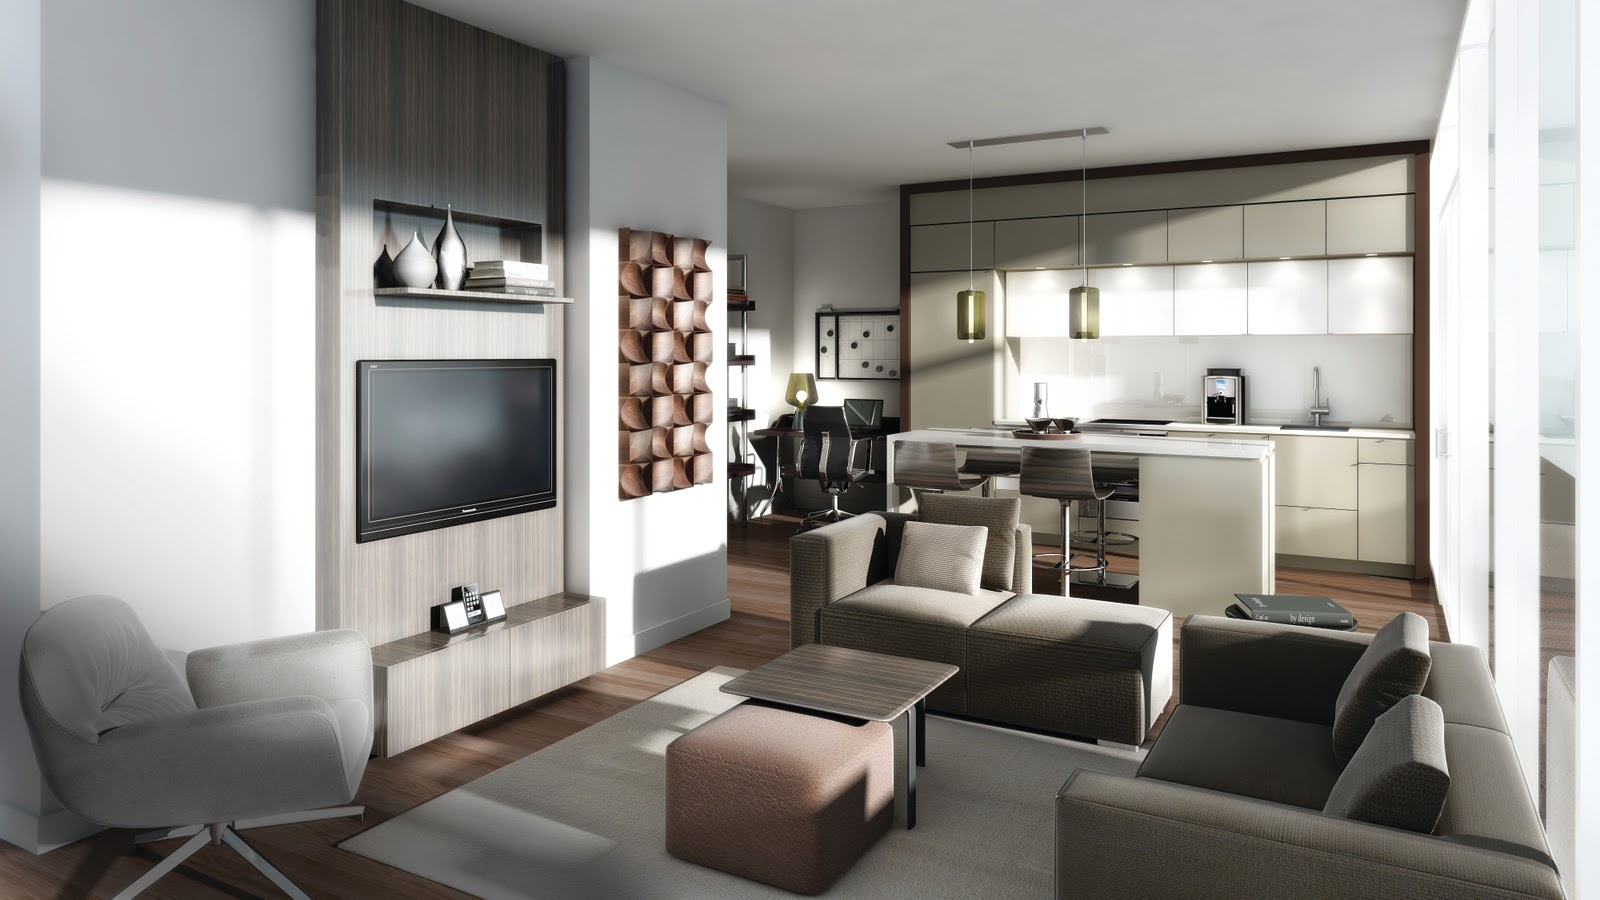 Karma condos talkcondo for Interior designs for condos